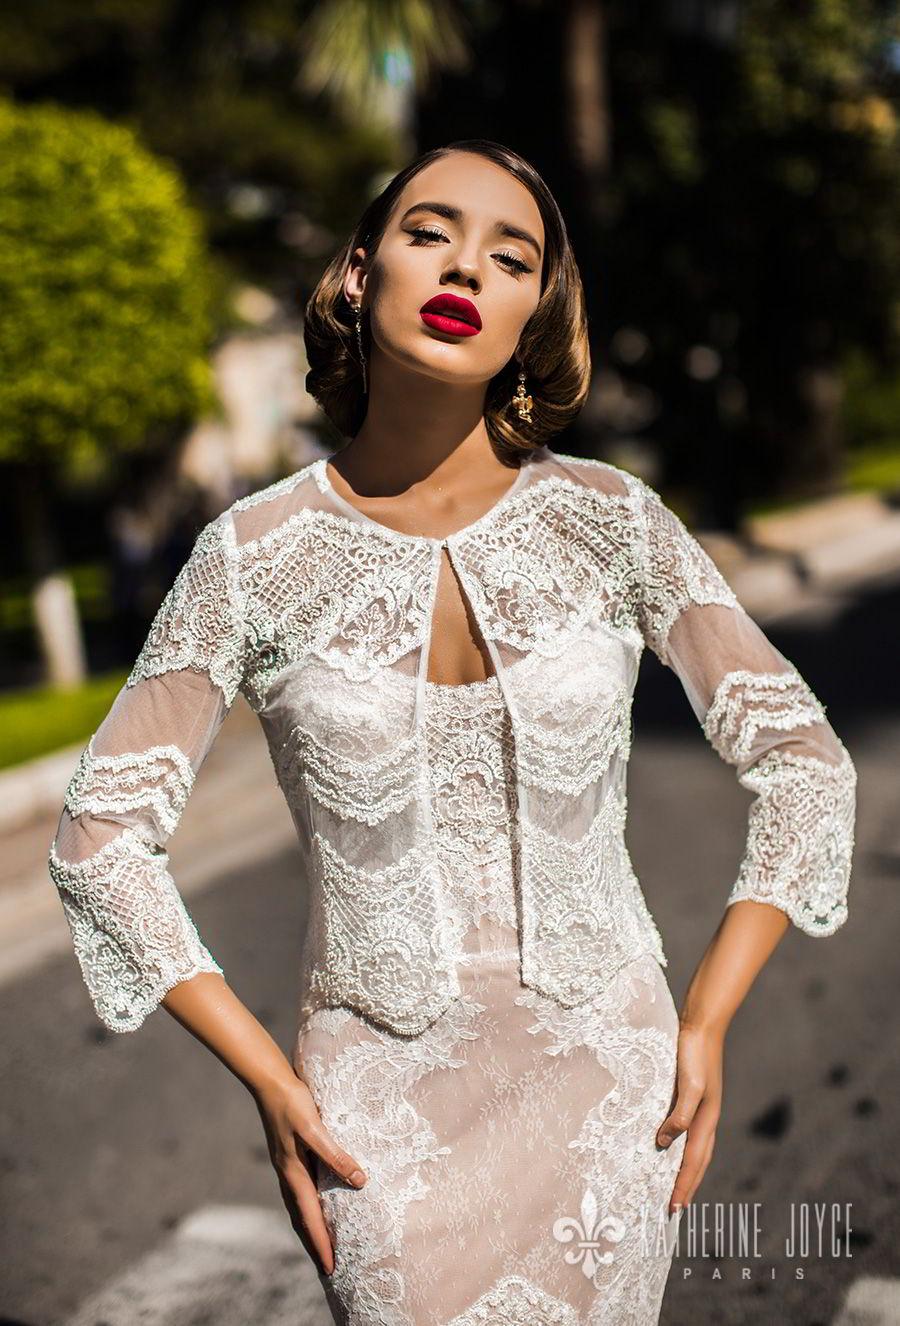 katherine joyce 2018 bridal three quarter sleeves sweetheart neckline heavily embellished bodice elegant sexy mermaid wedding dress lace jacket chapel train (bonita) zv